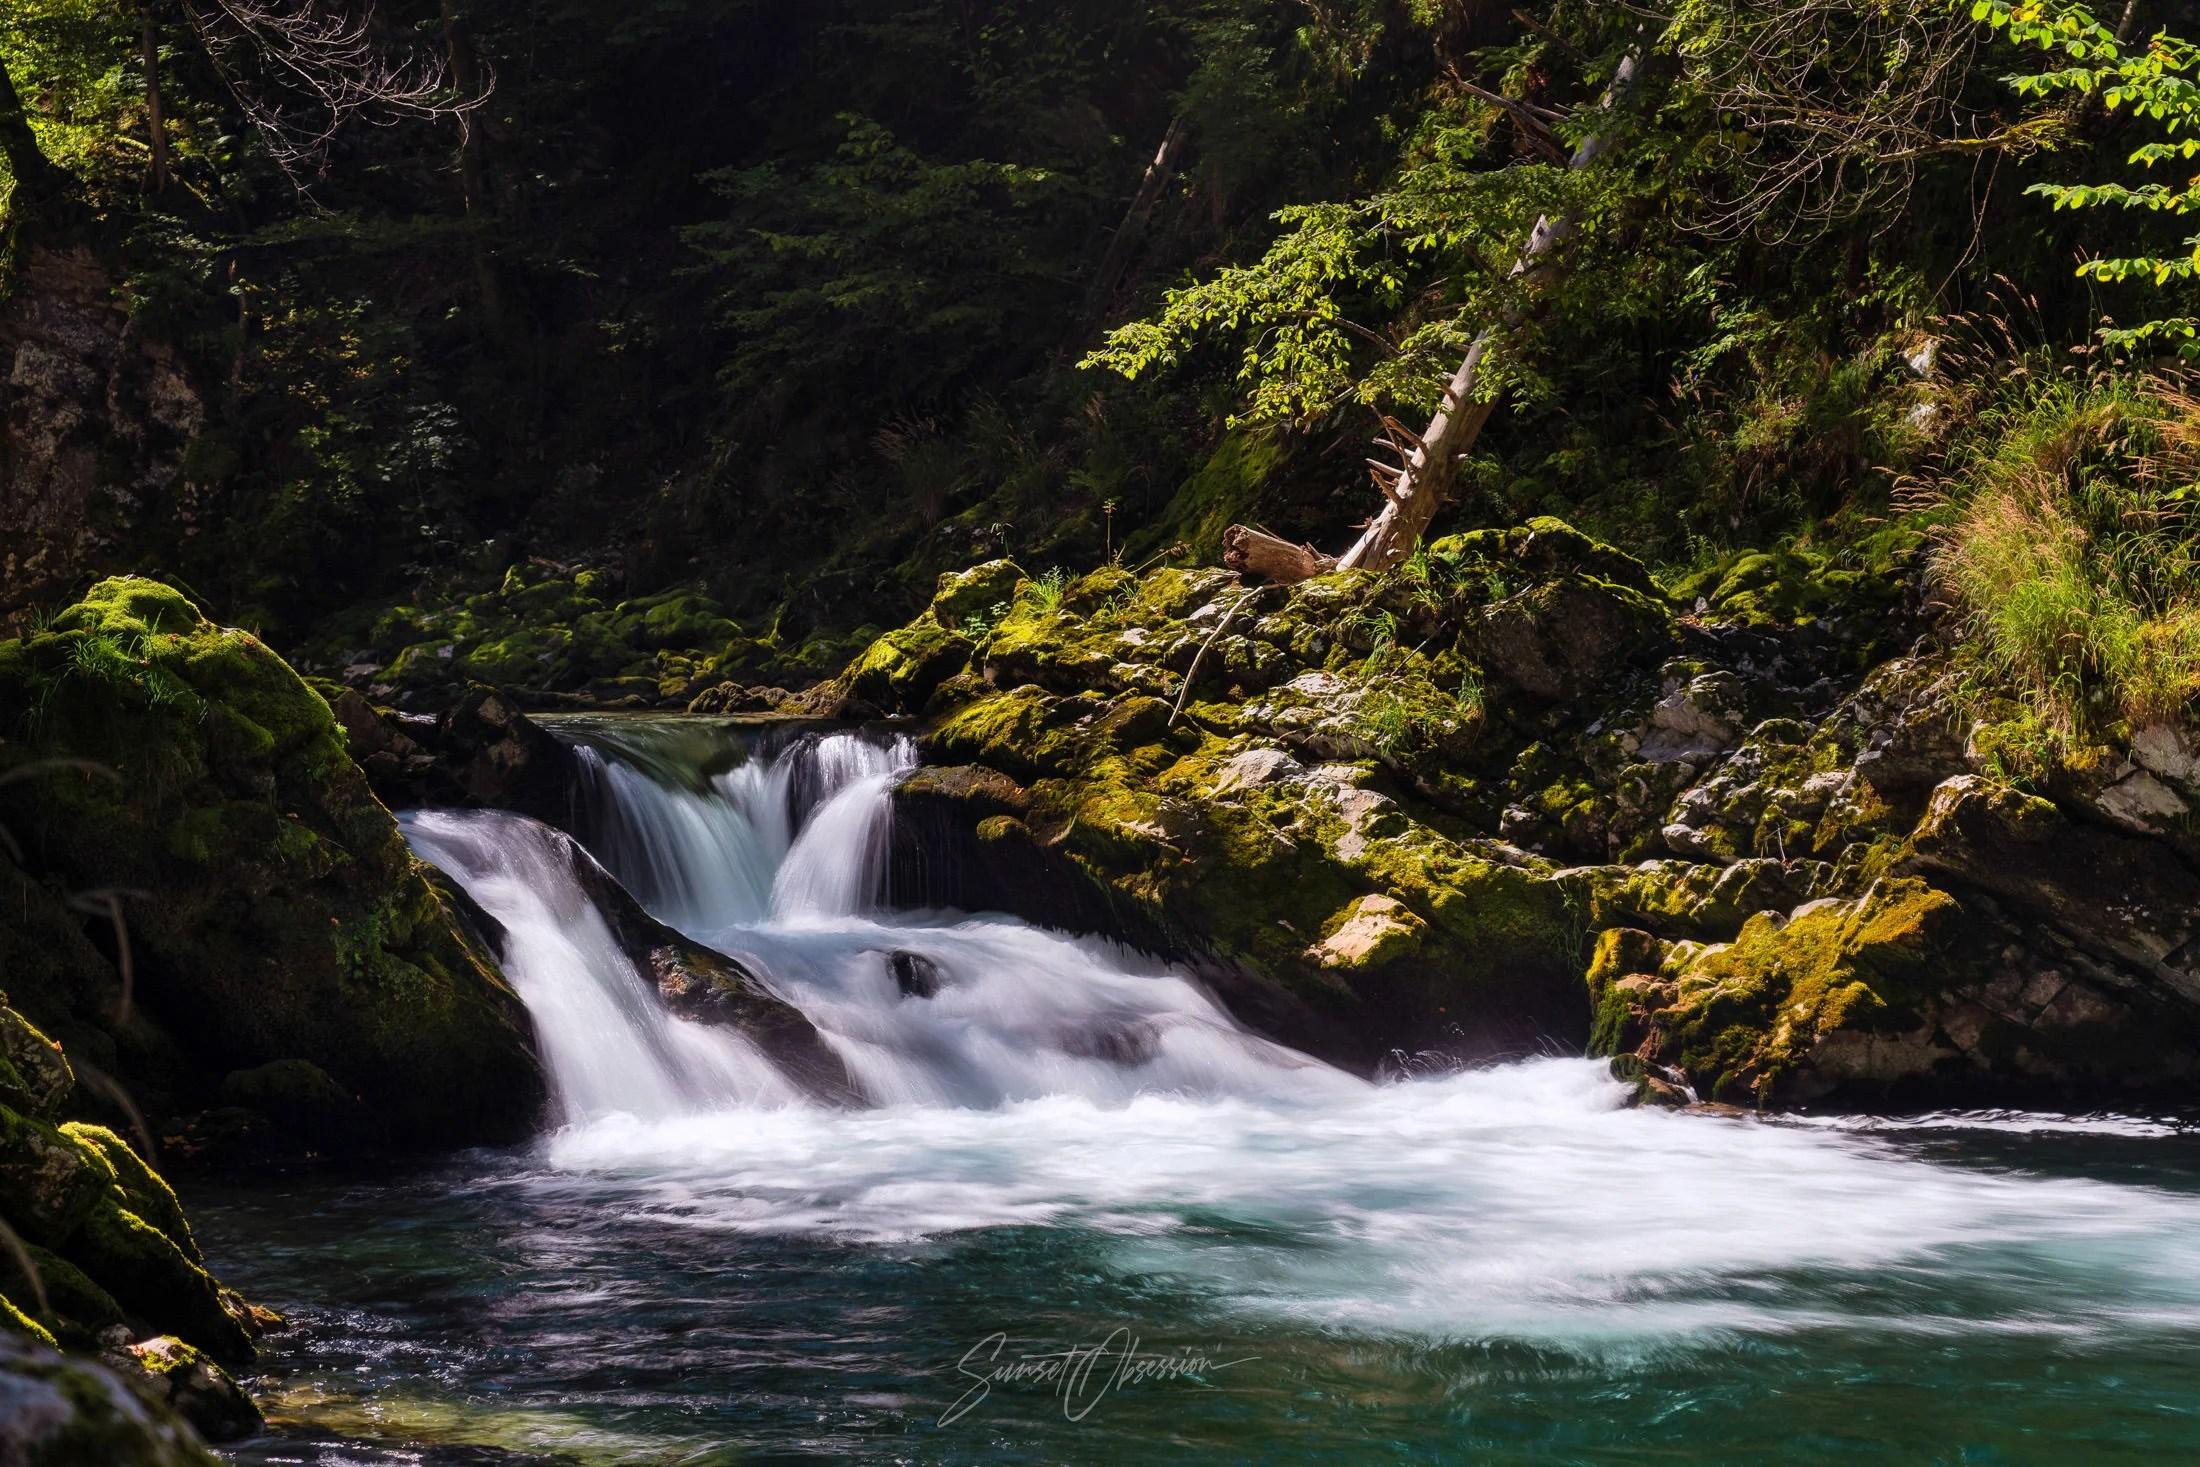 River Cascades in Vintgar Gorge, Slovenia